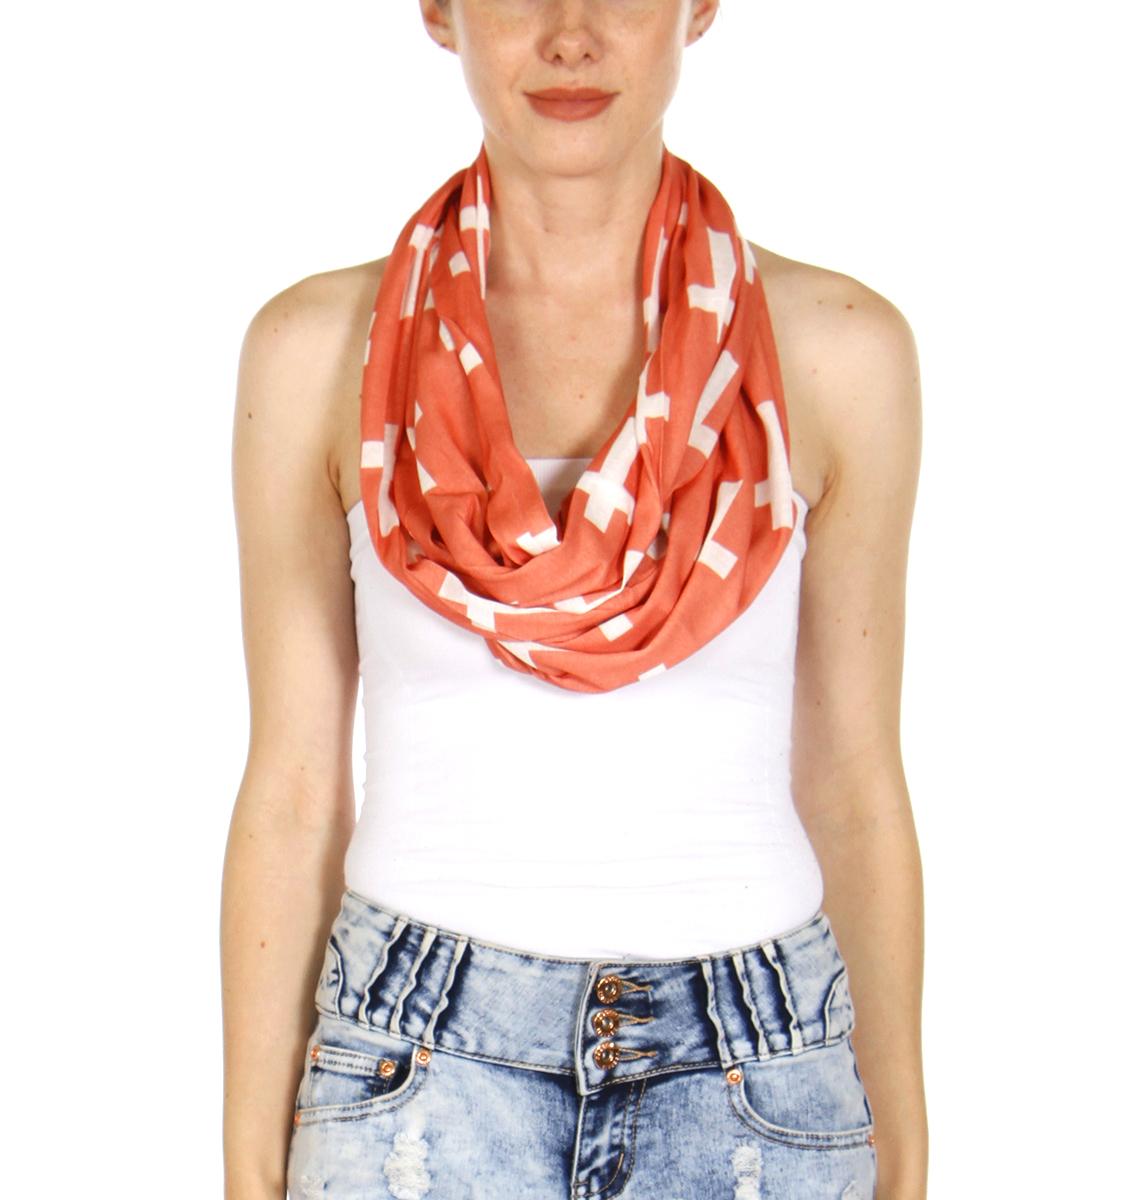 27176f45424e6 wholesale Cross print light weight infinity scarf